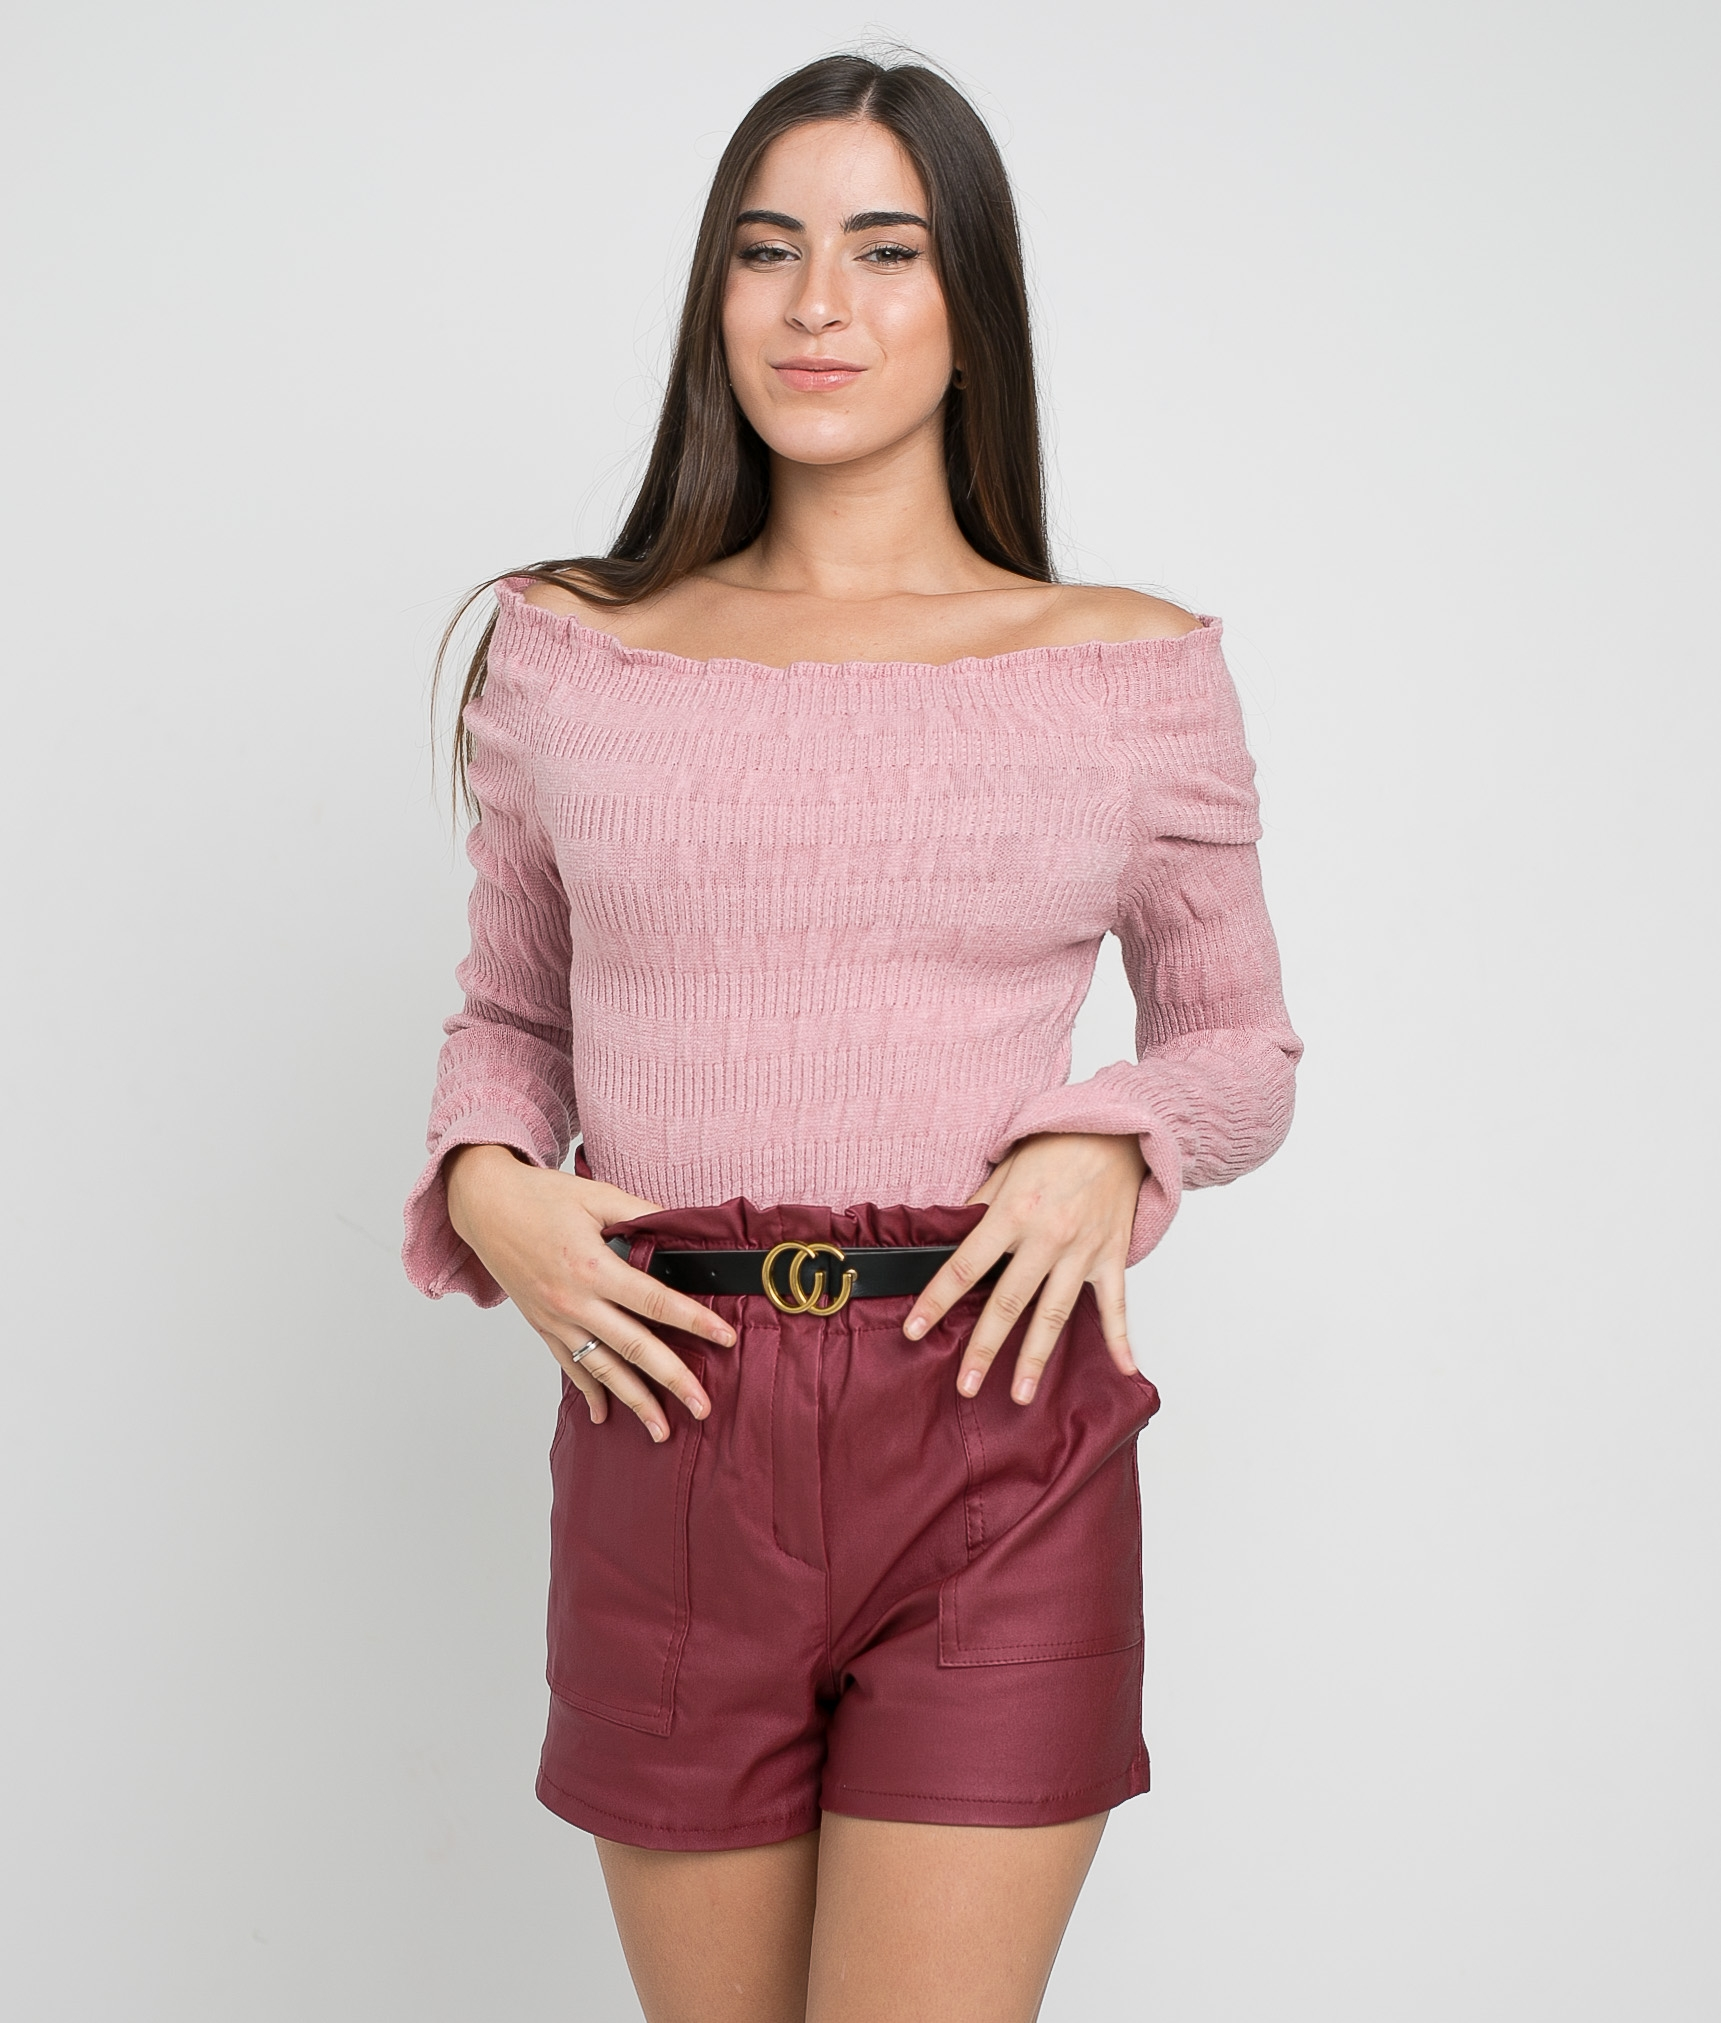 Camisola Saradis - Rosa